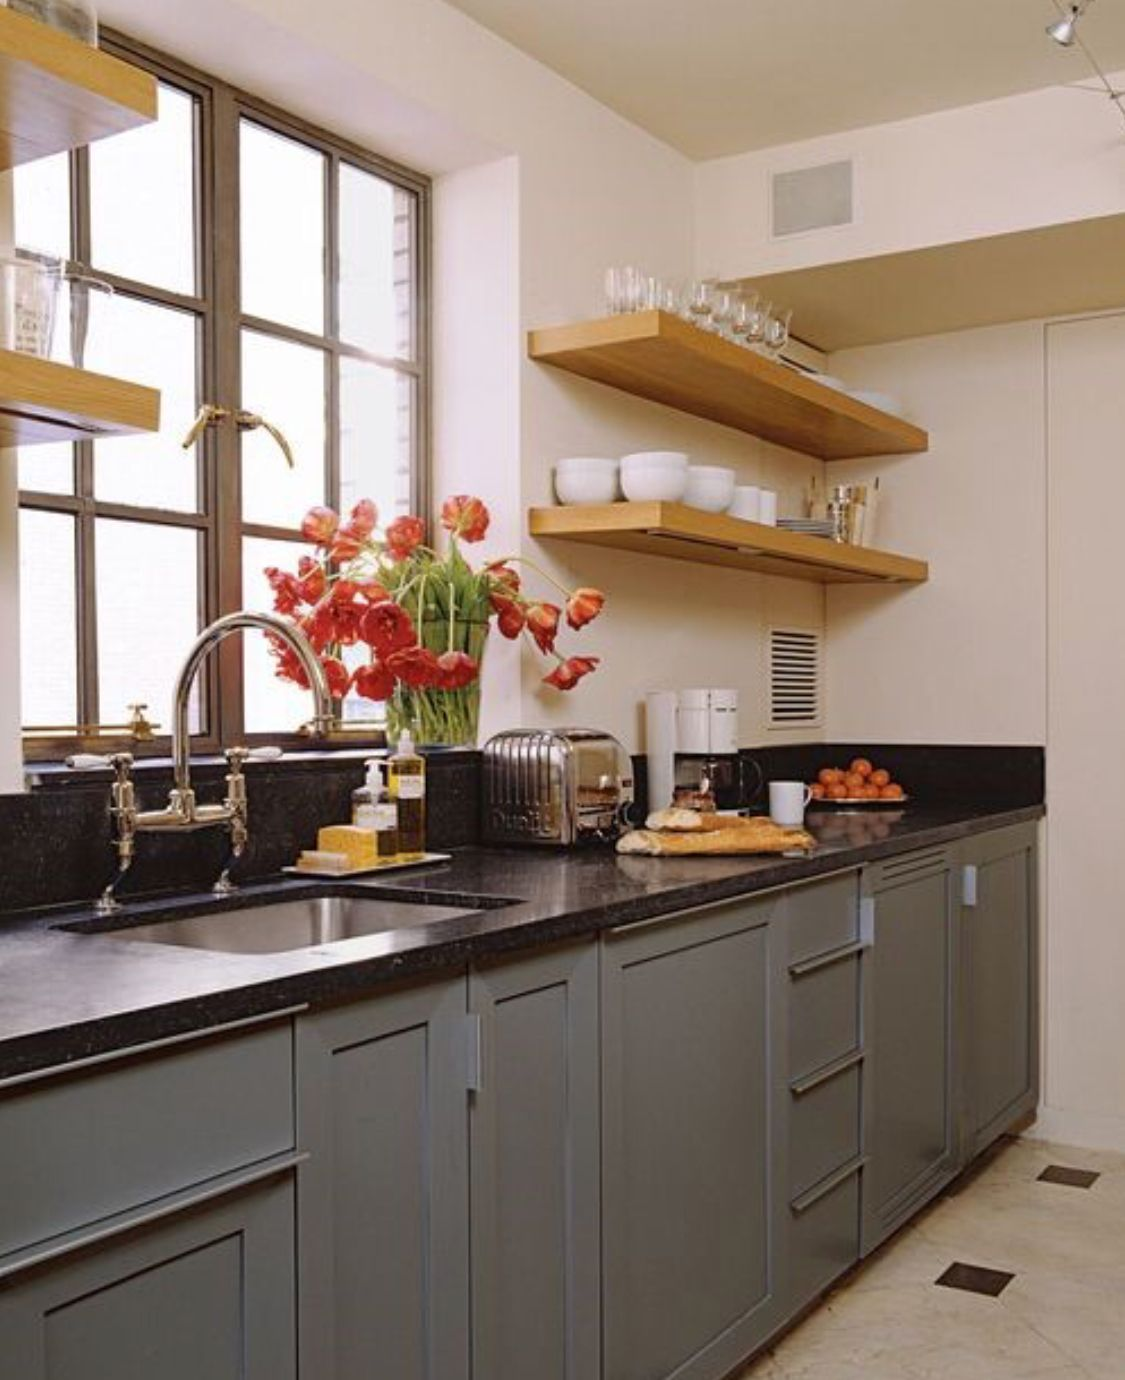 ideavicky yang on kitchen 18th ave  simple kitchen design kitchen remodel small kitchen